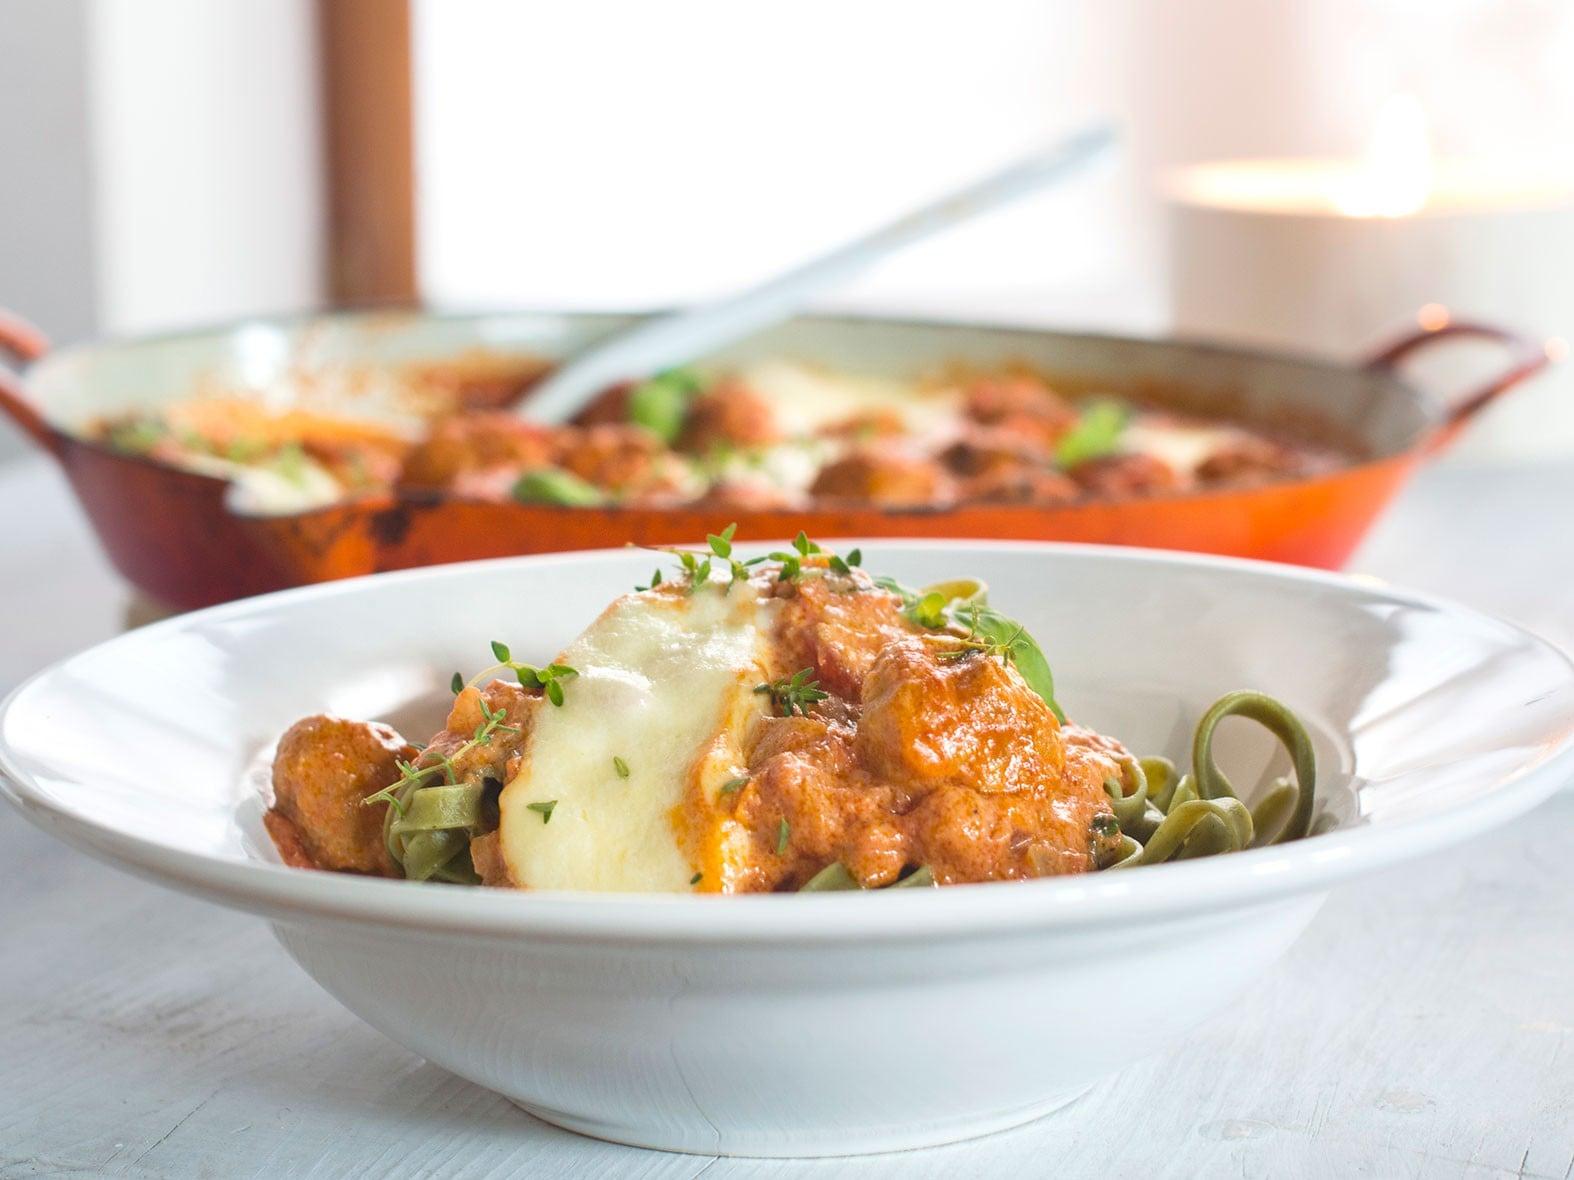 Boulettes sauce tomate